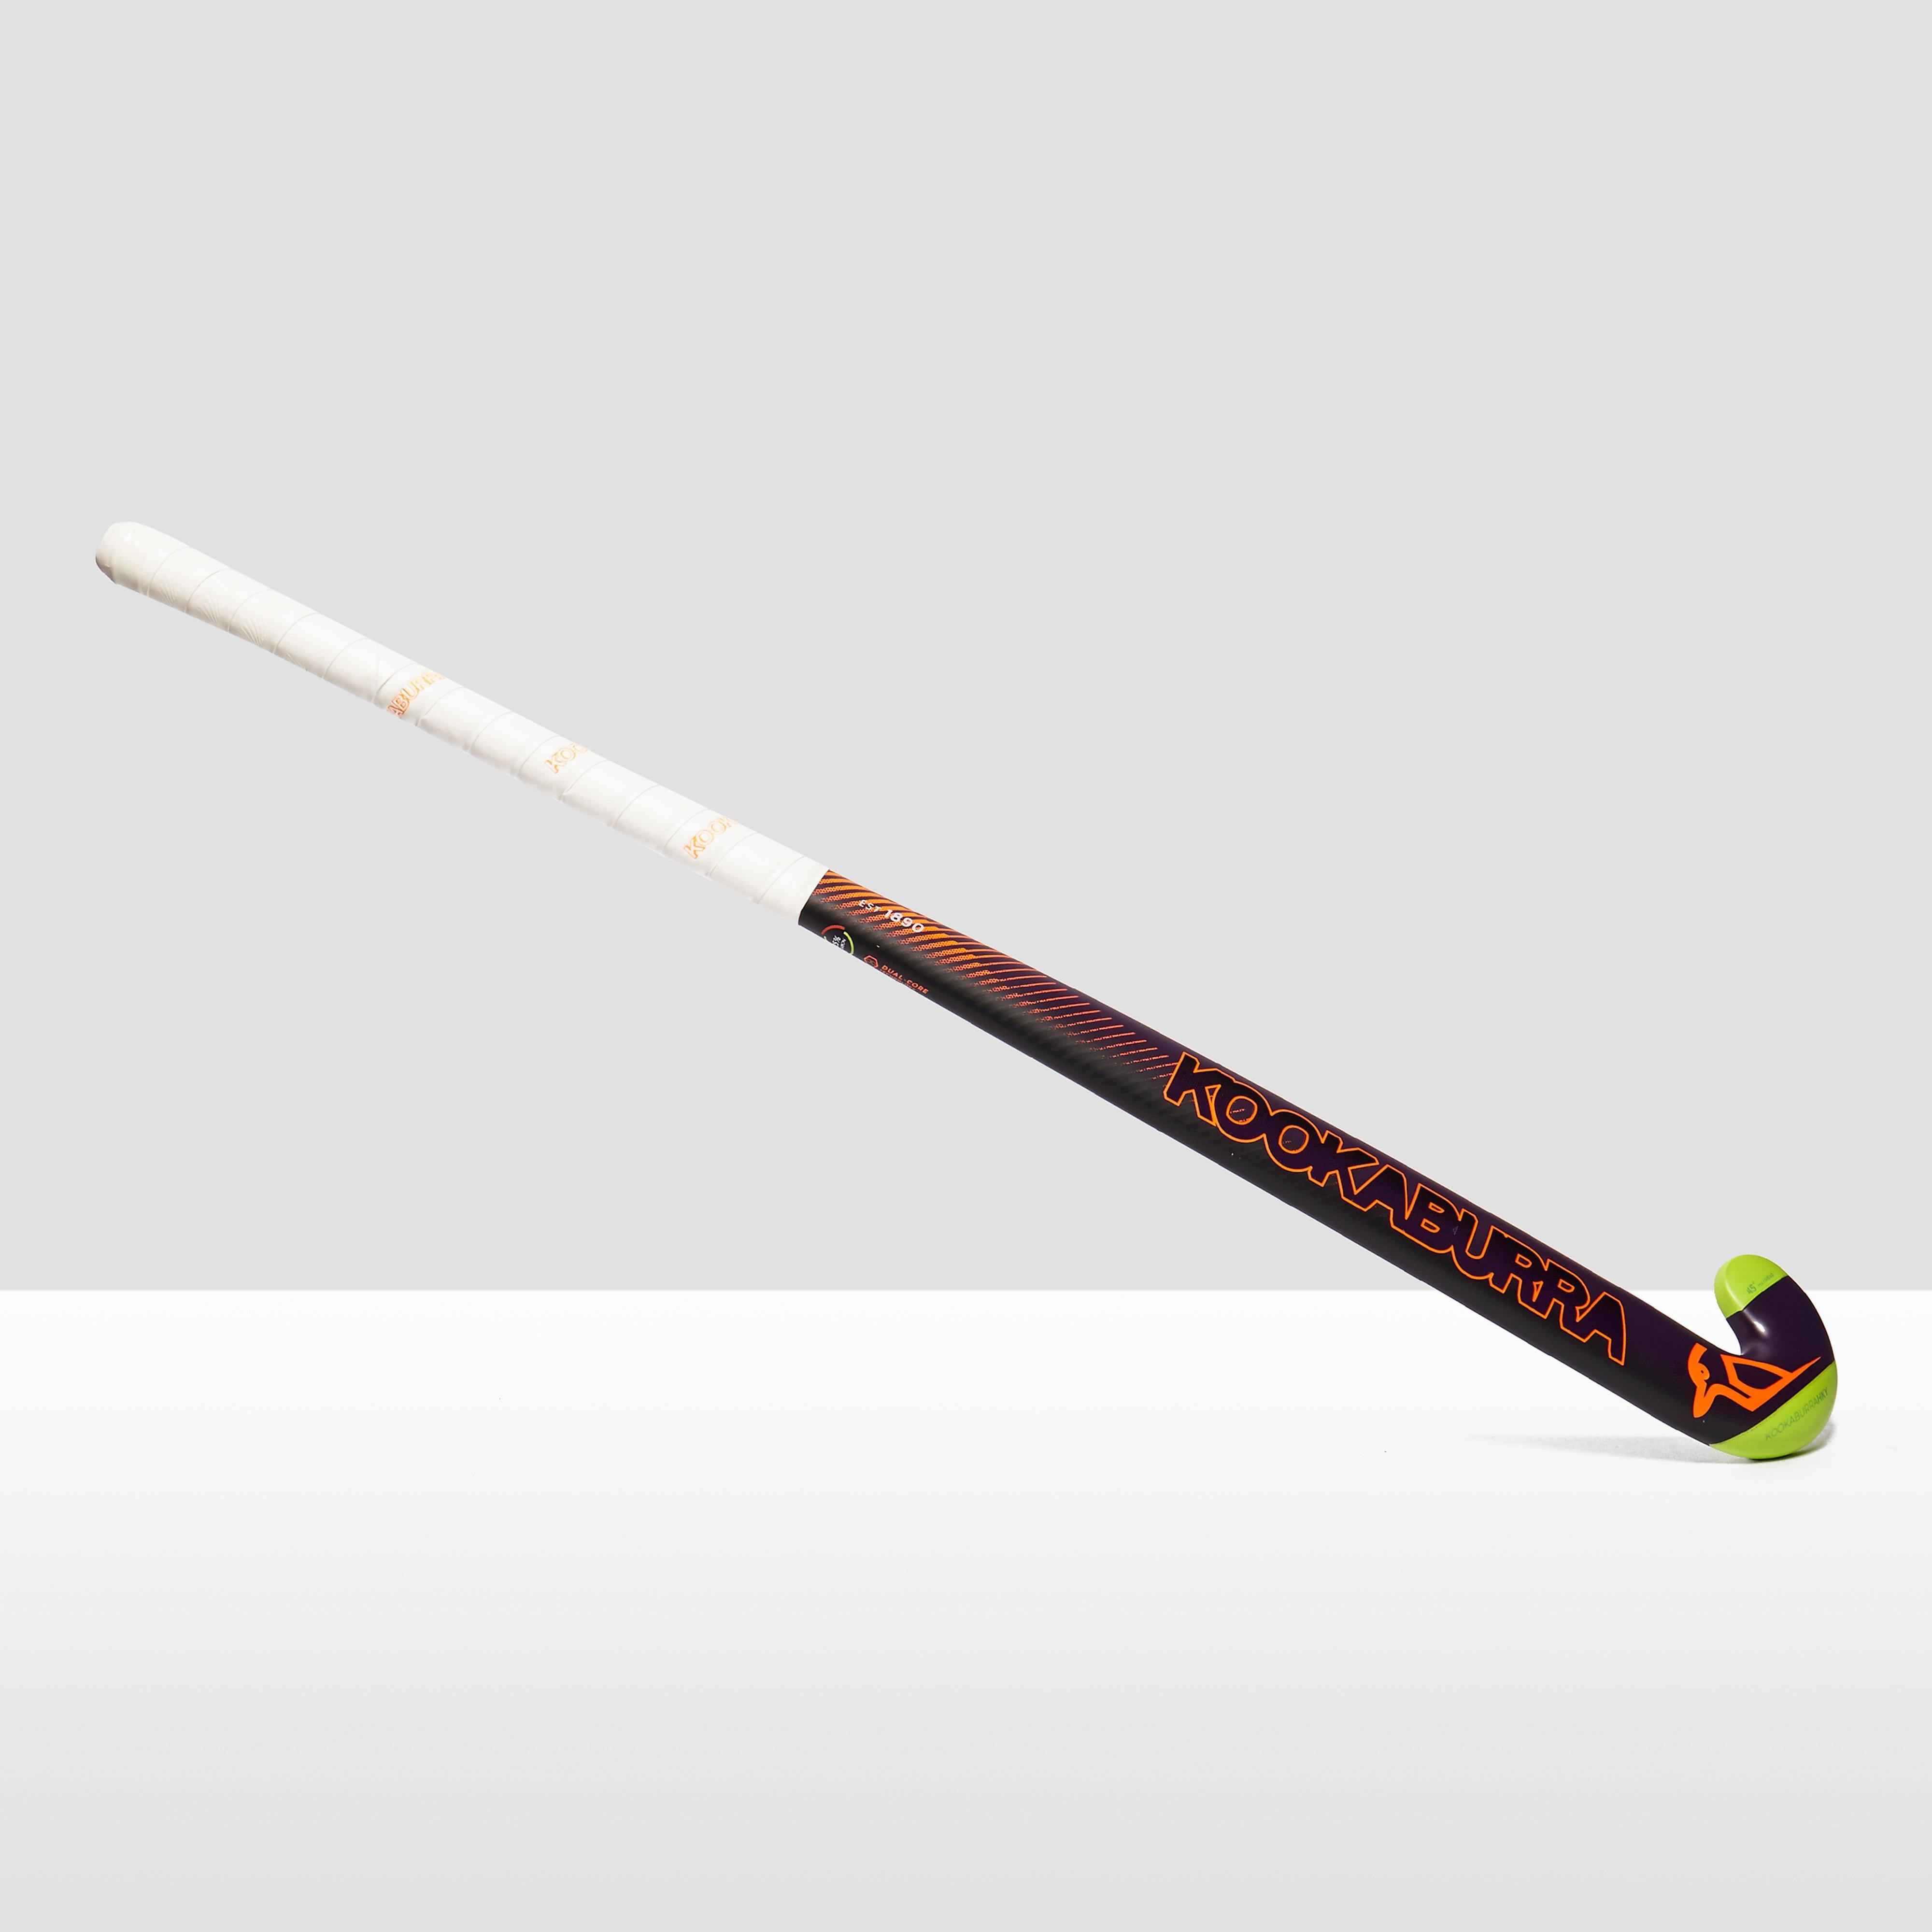 Kookaburra Strobe Adult Hockey Stick